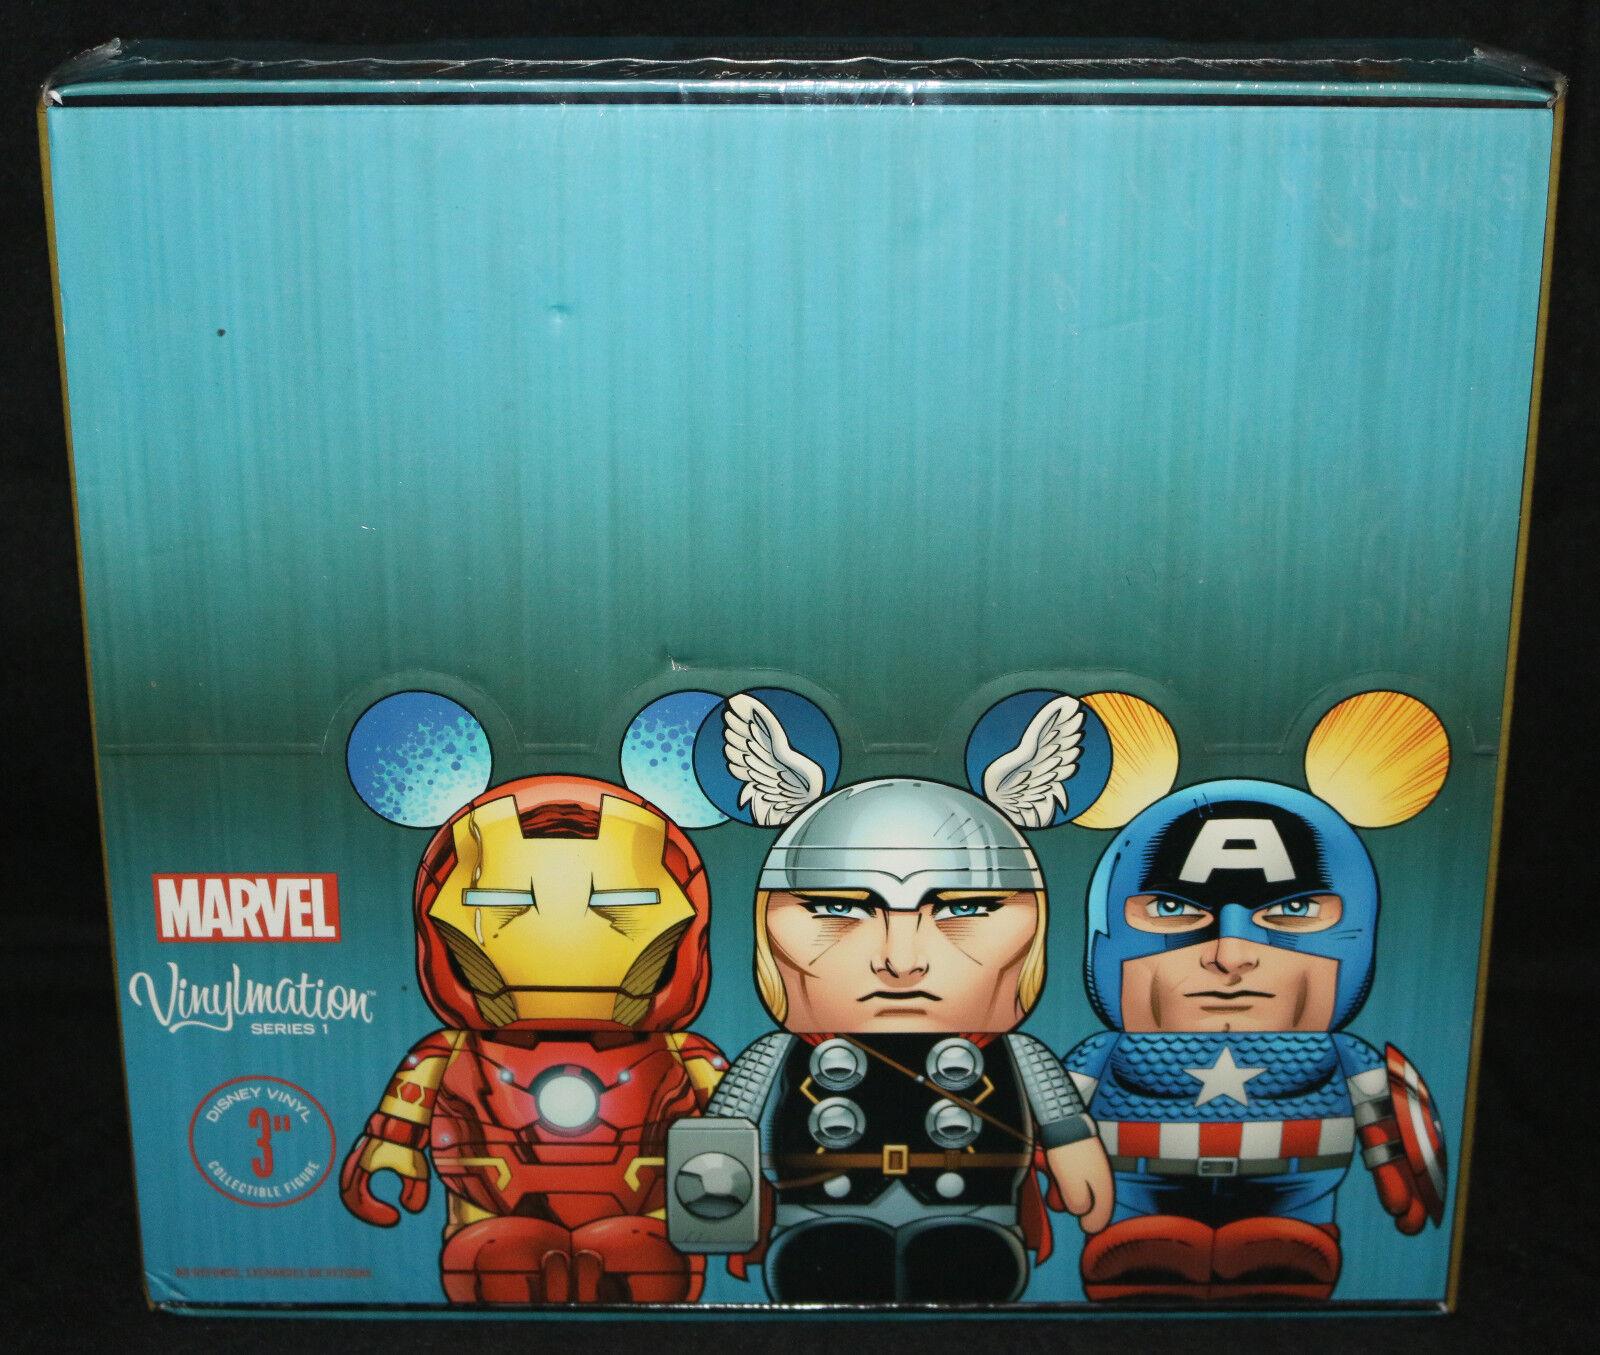 Marvel Vinylmation Series 1 - 3  Collectible Figure (MIB   Sealed) Rare 2013